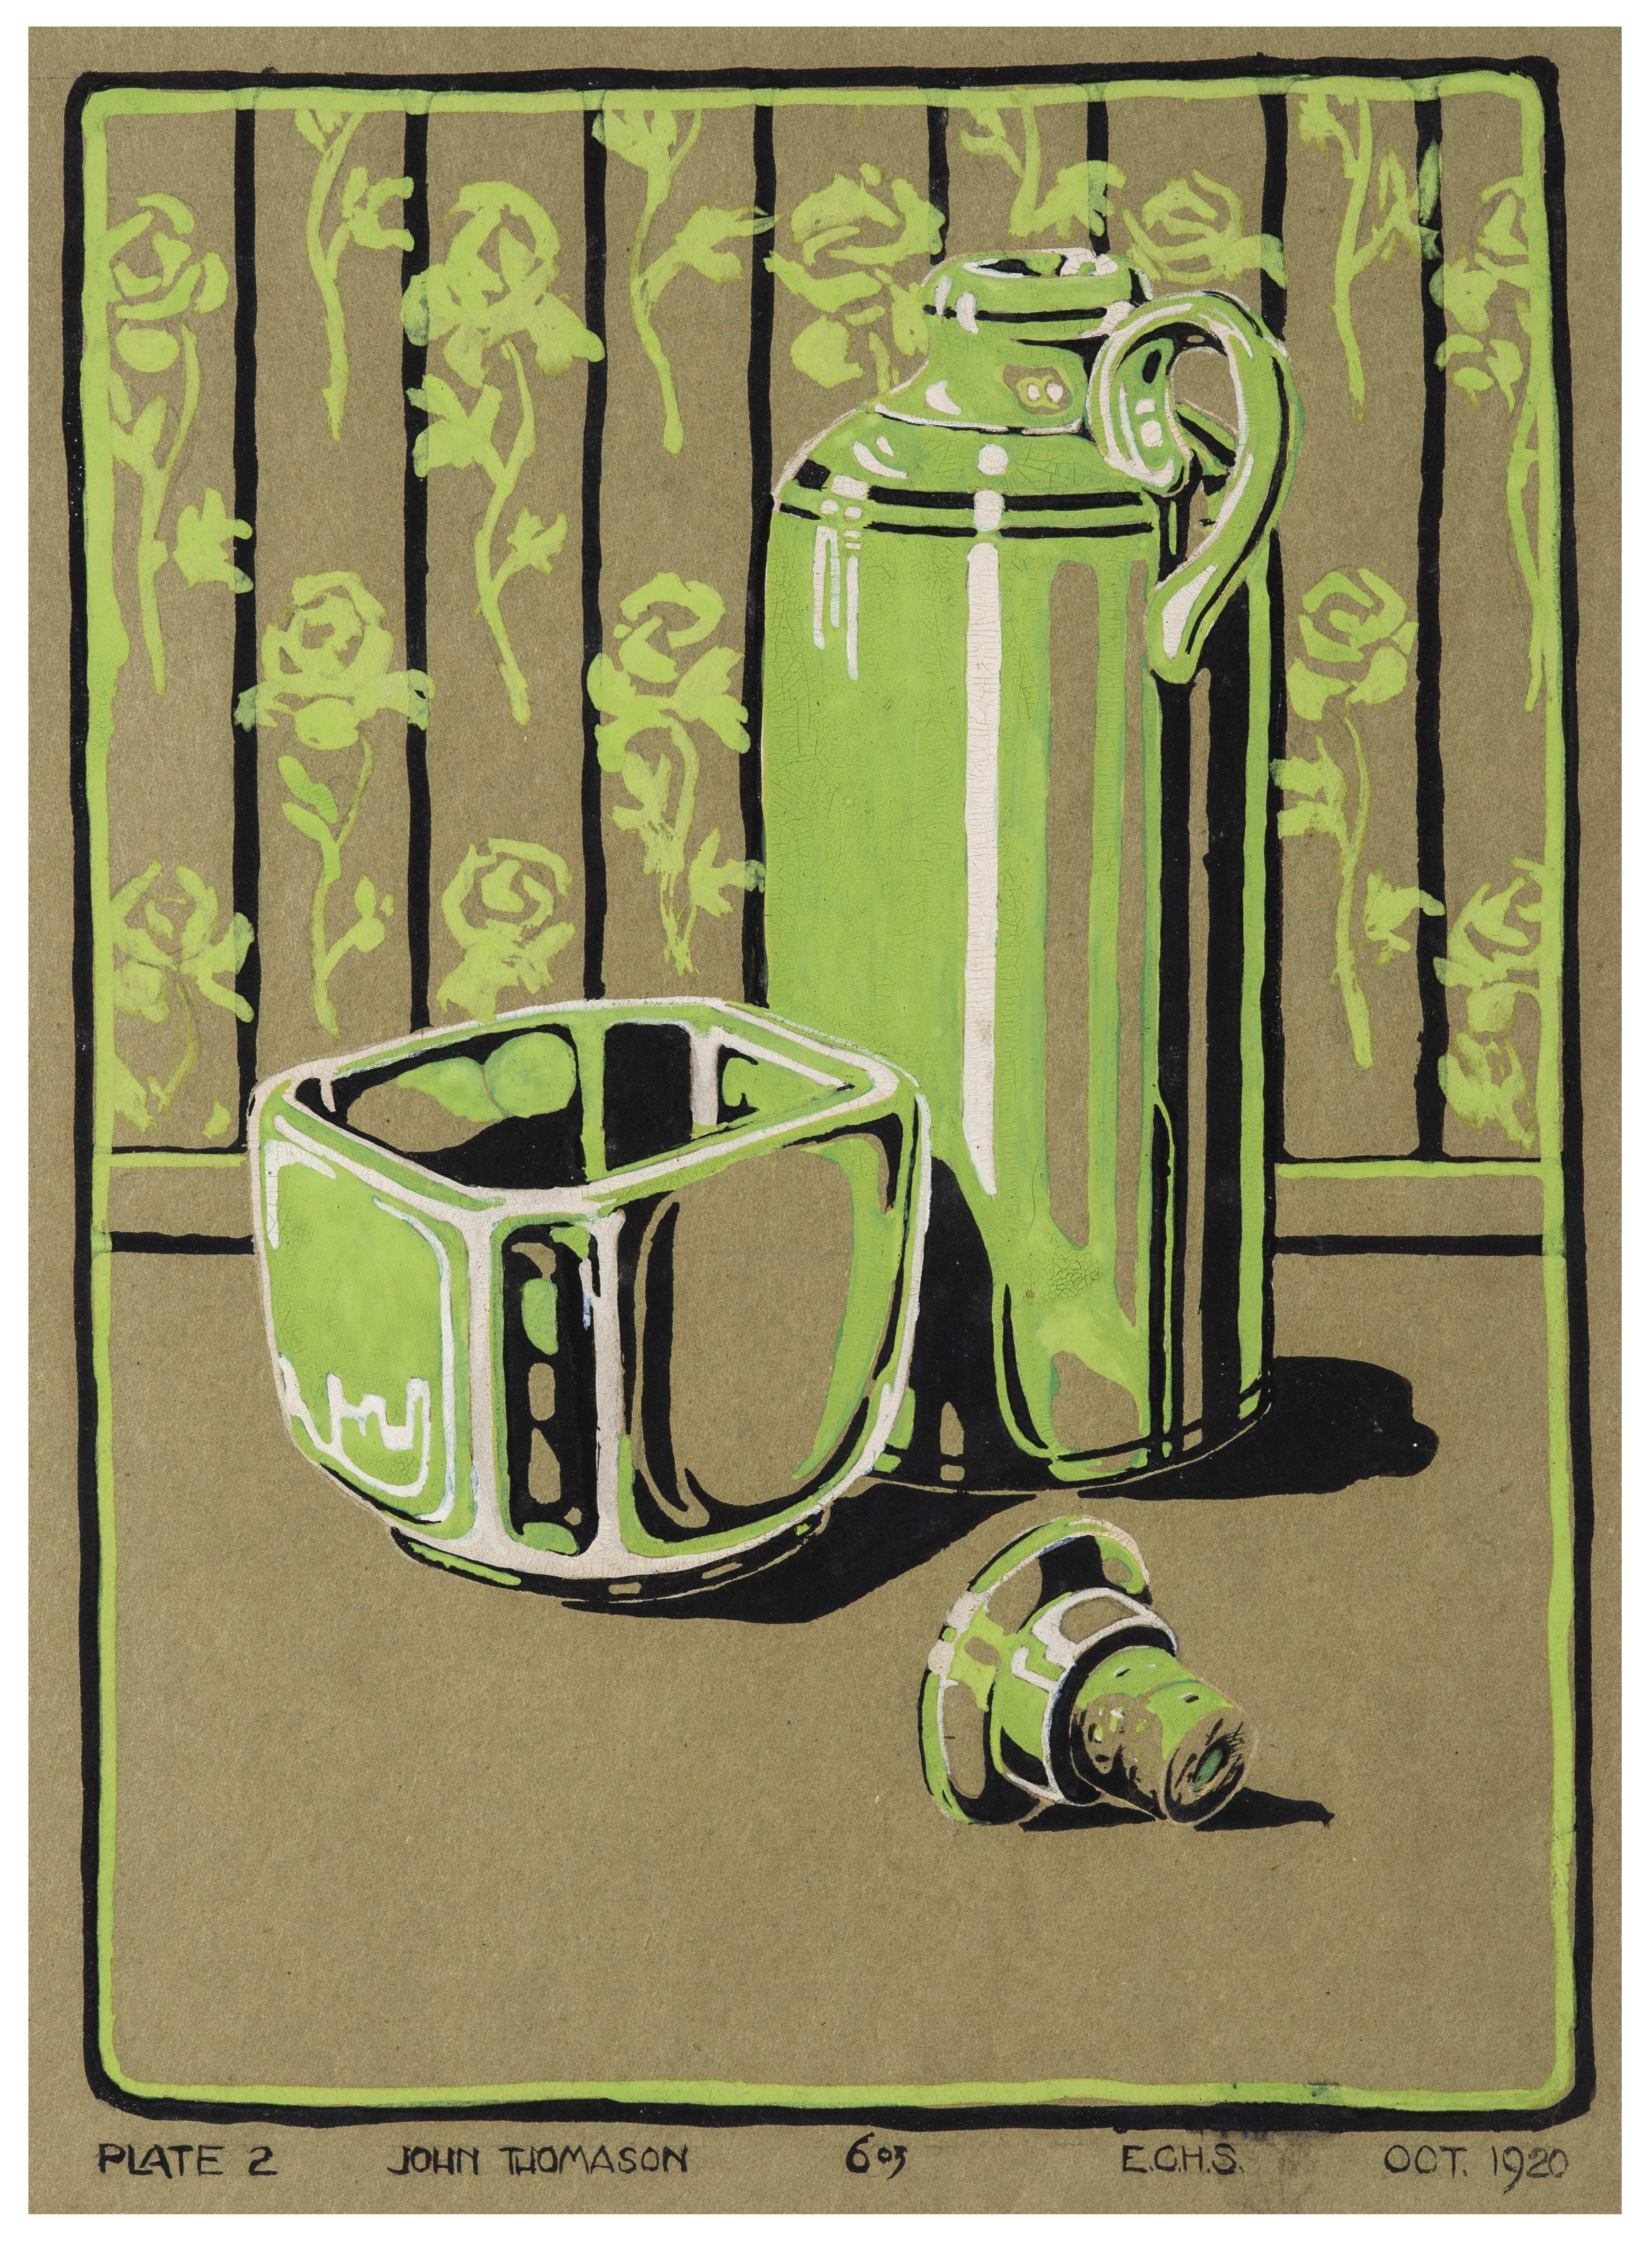 A Vintage Art Deco John Thomason Still Life Illustration Art Painting Dated 1920